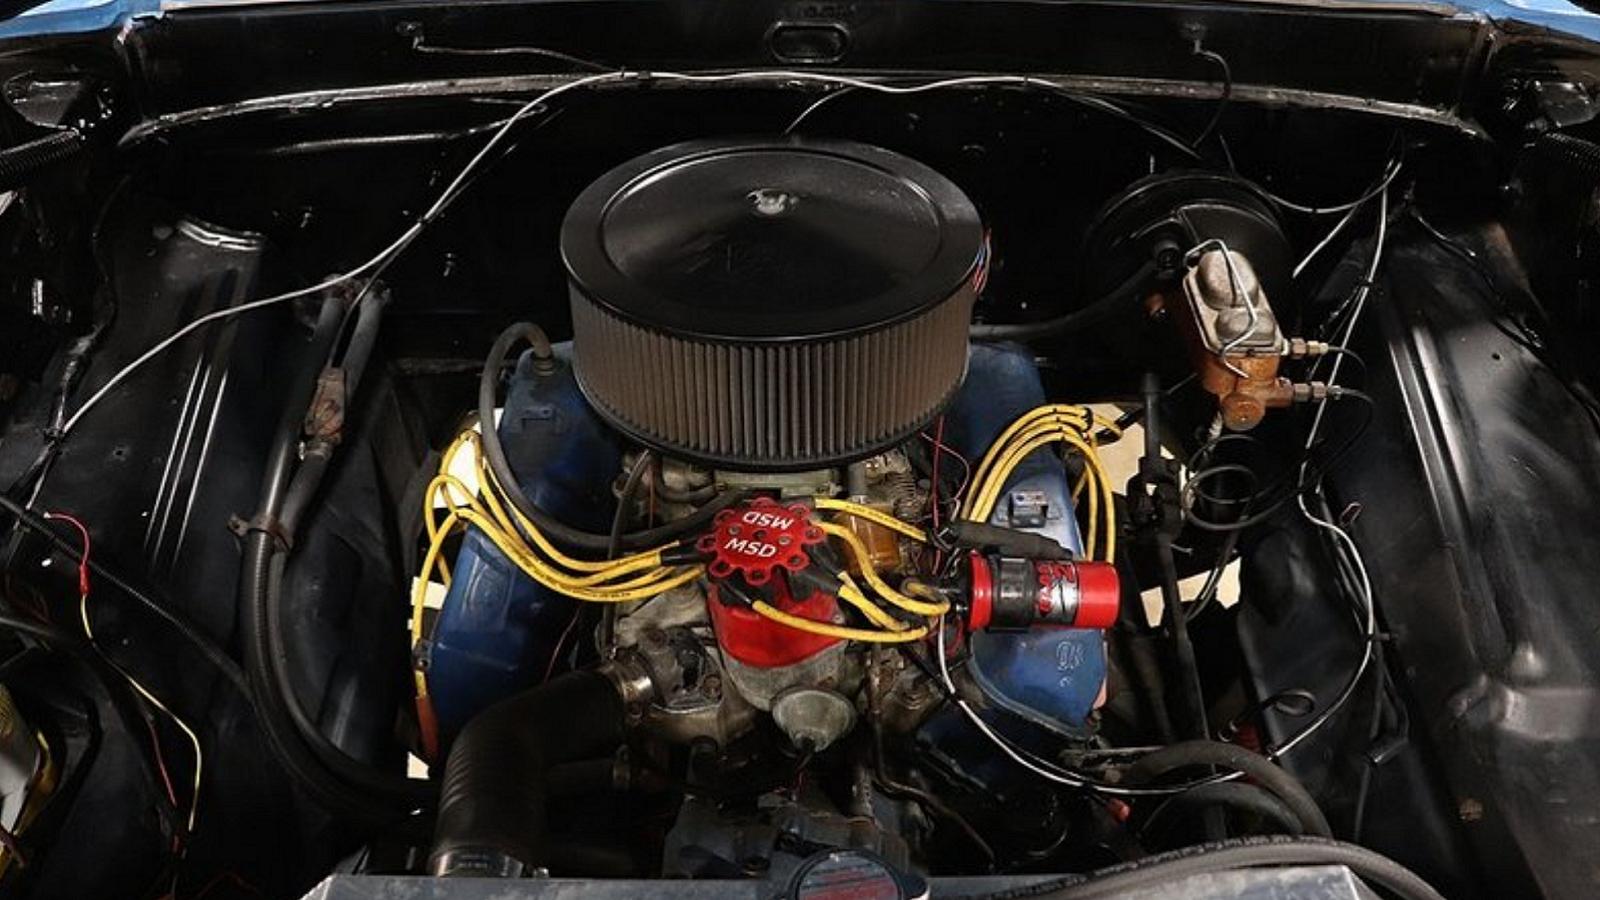 Ford F-100: Part Blue, Part Black, 100% Badass